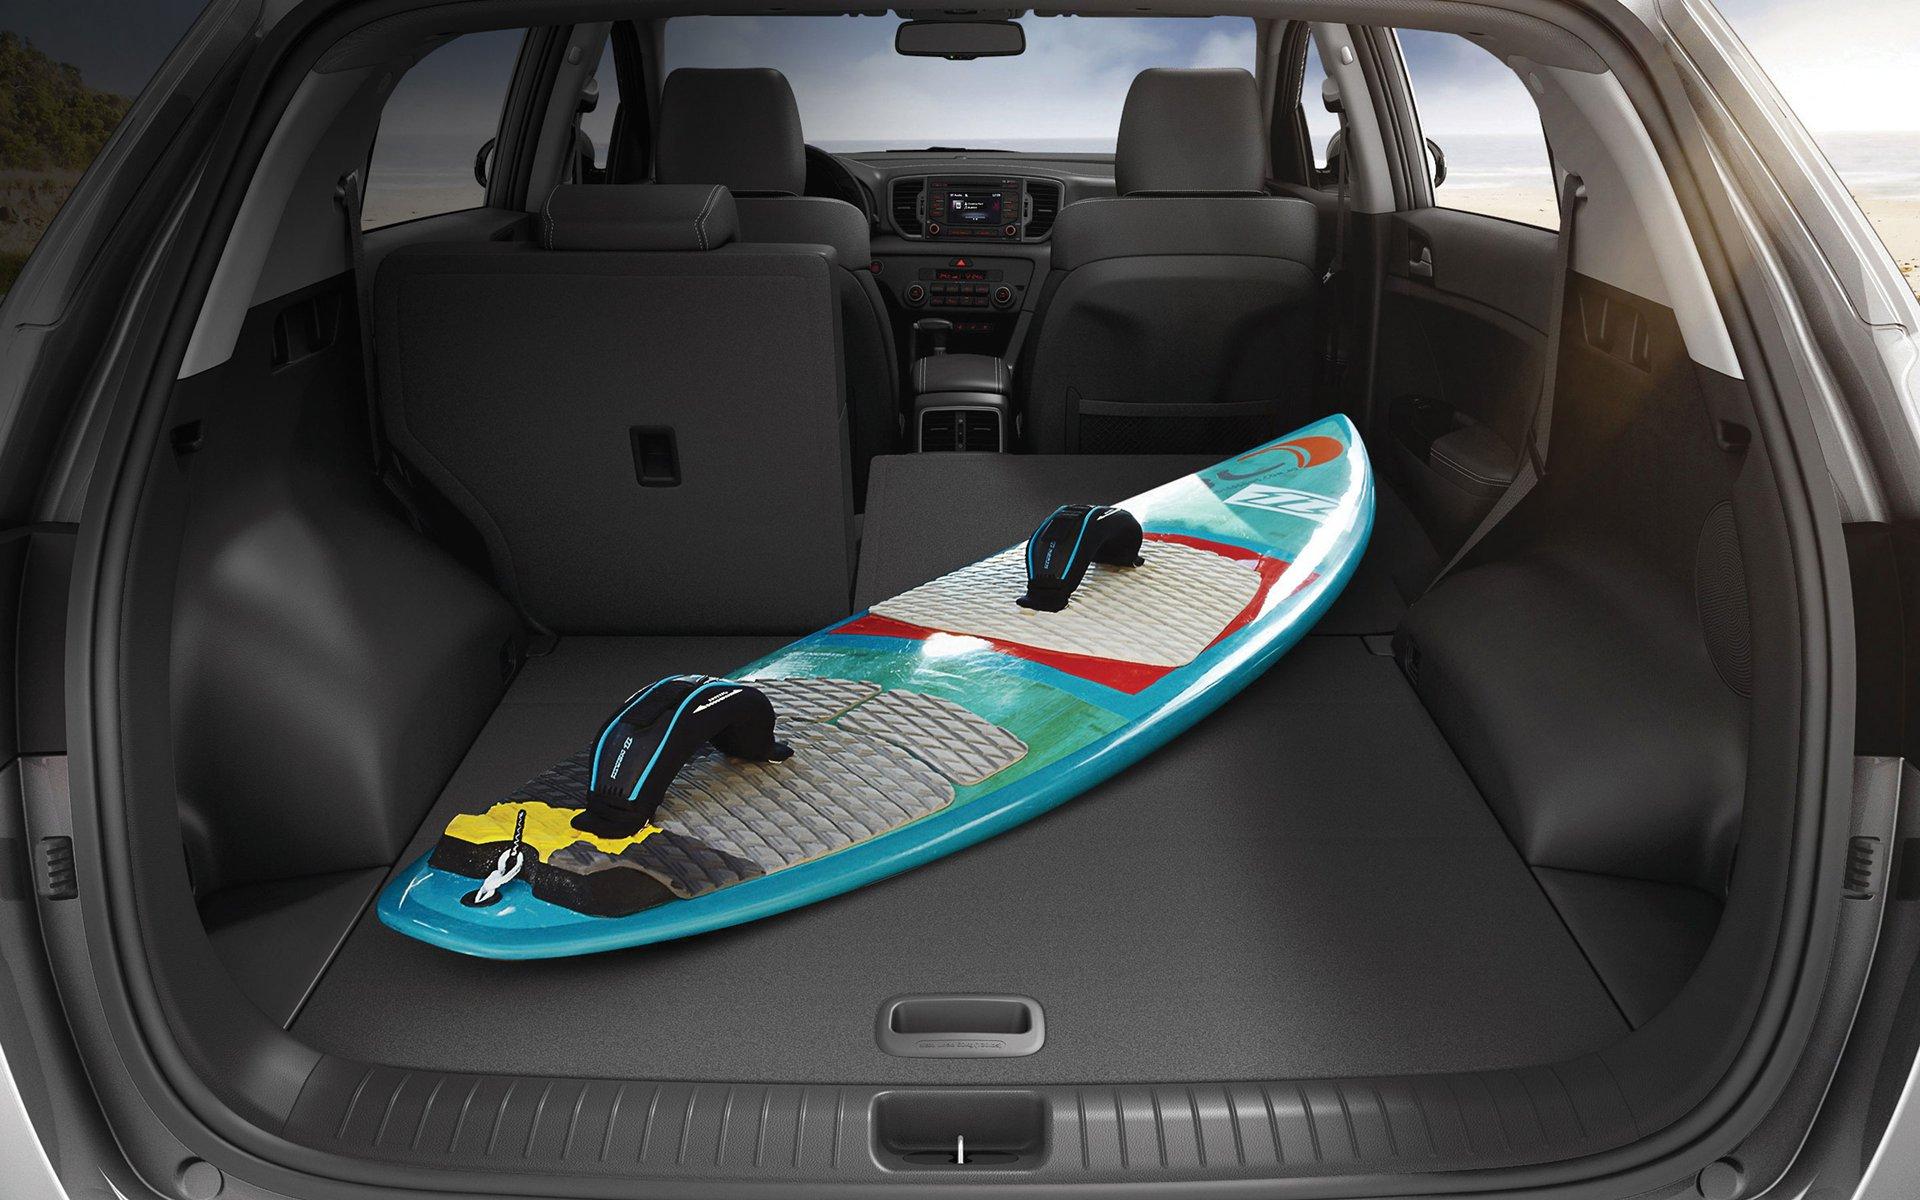 New Kia Sportage Interior image 1